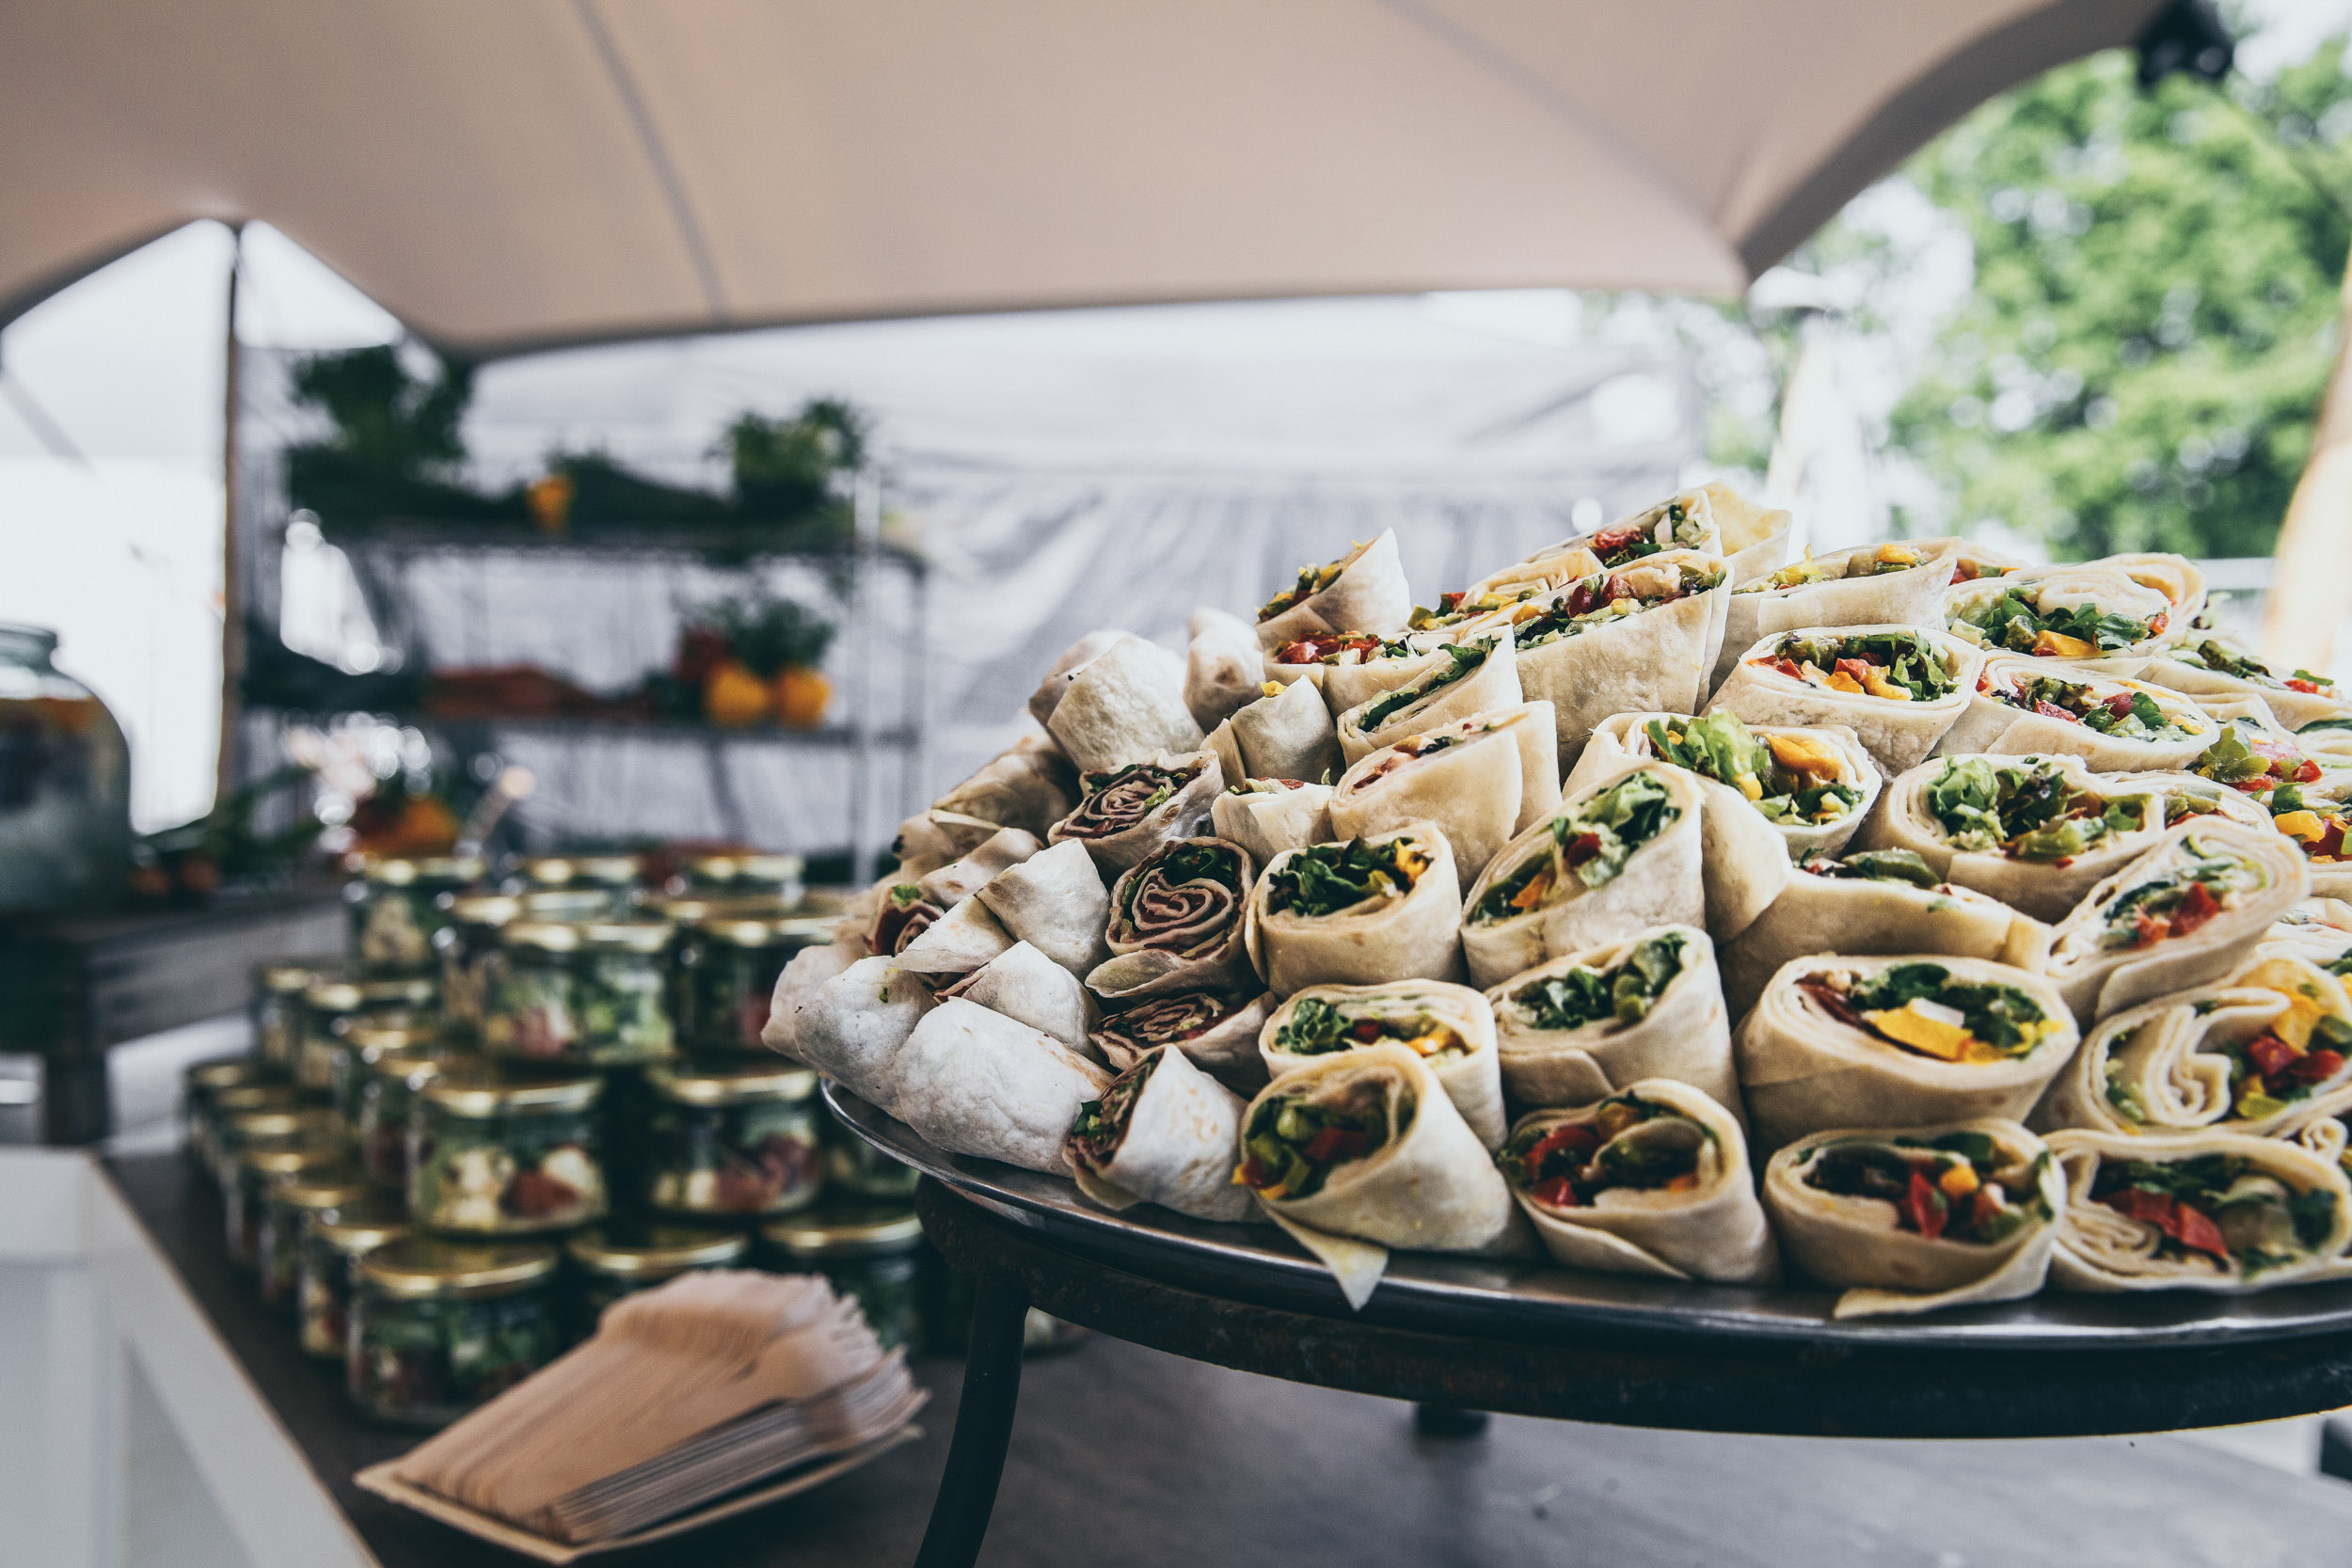 hofmans, catering, events,